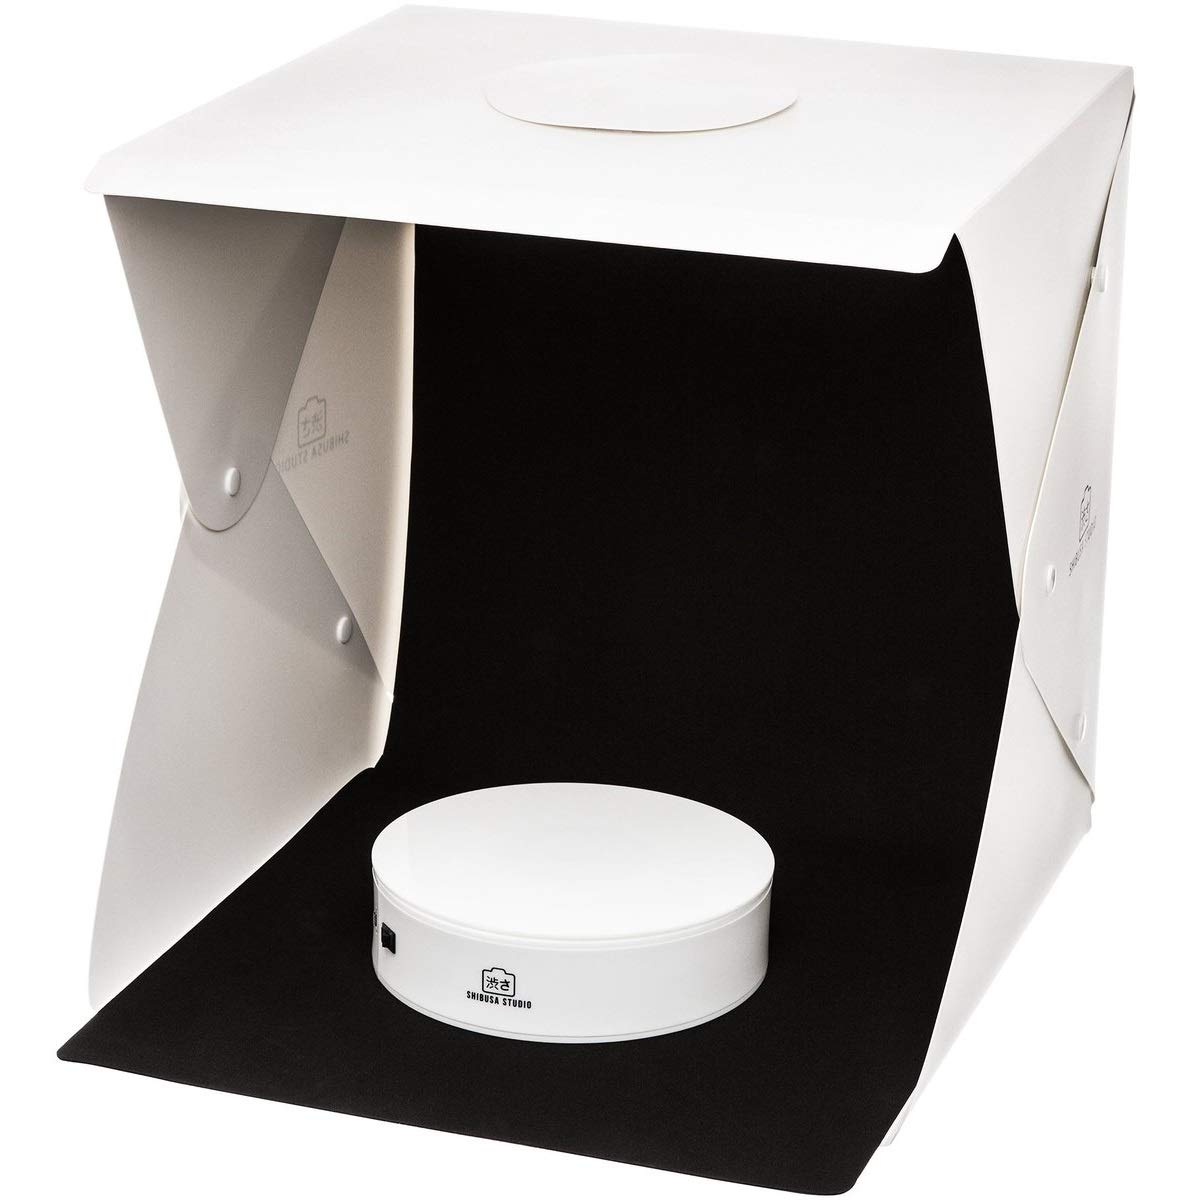 Shibusa Home Photo Studio Lightbox with Bonus 360° Turntable (Large)